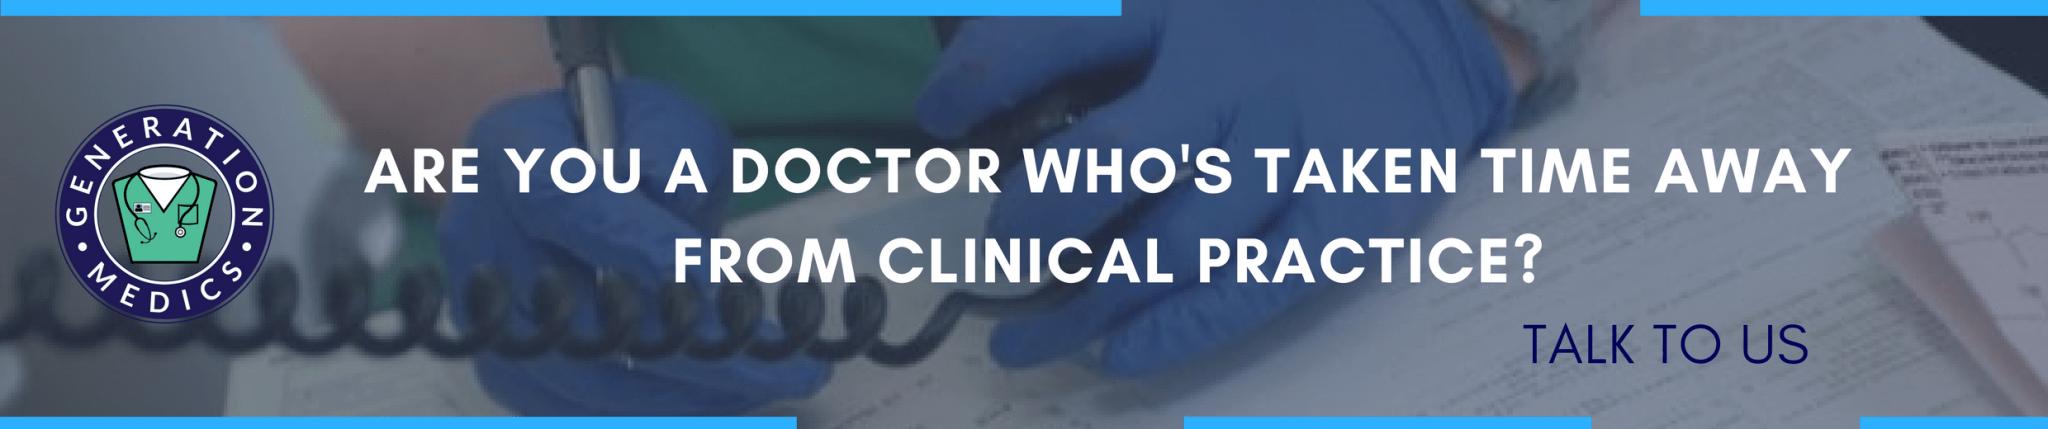 Returning doctors,